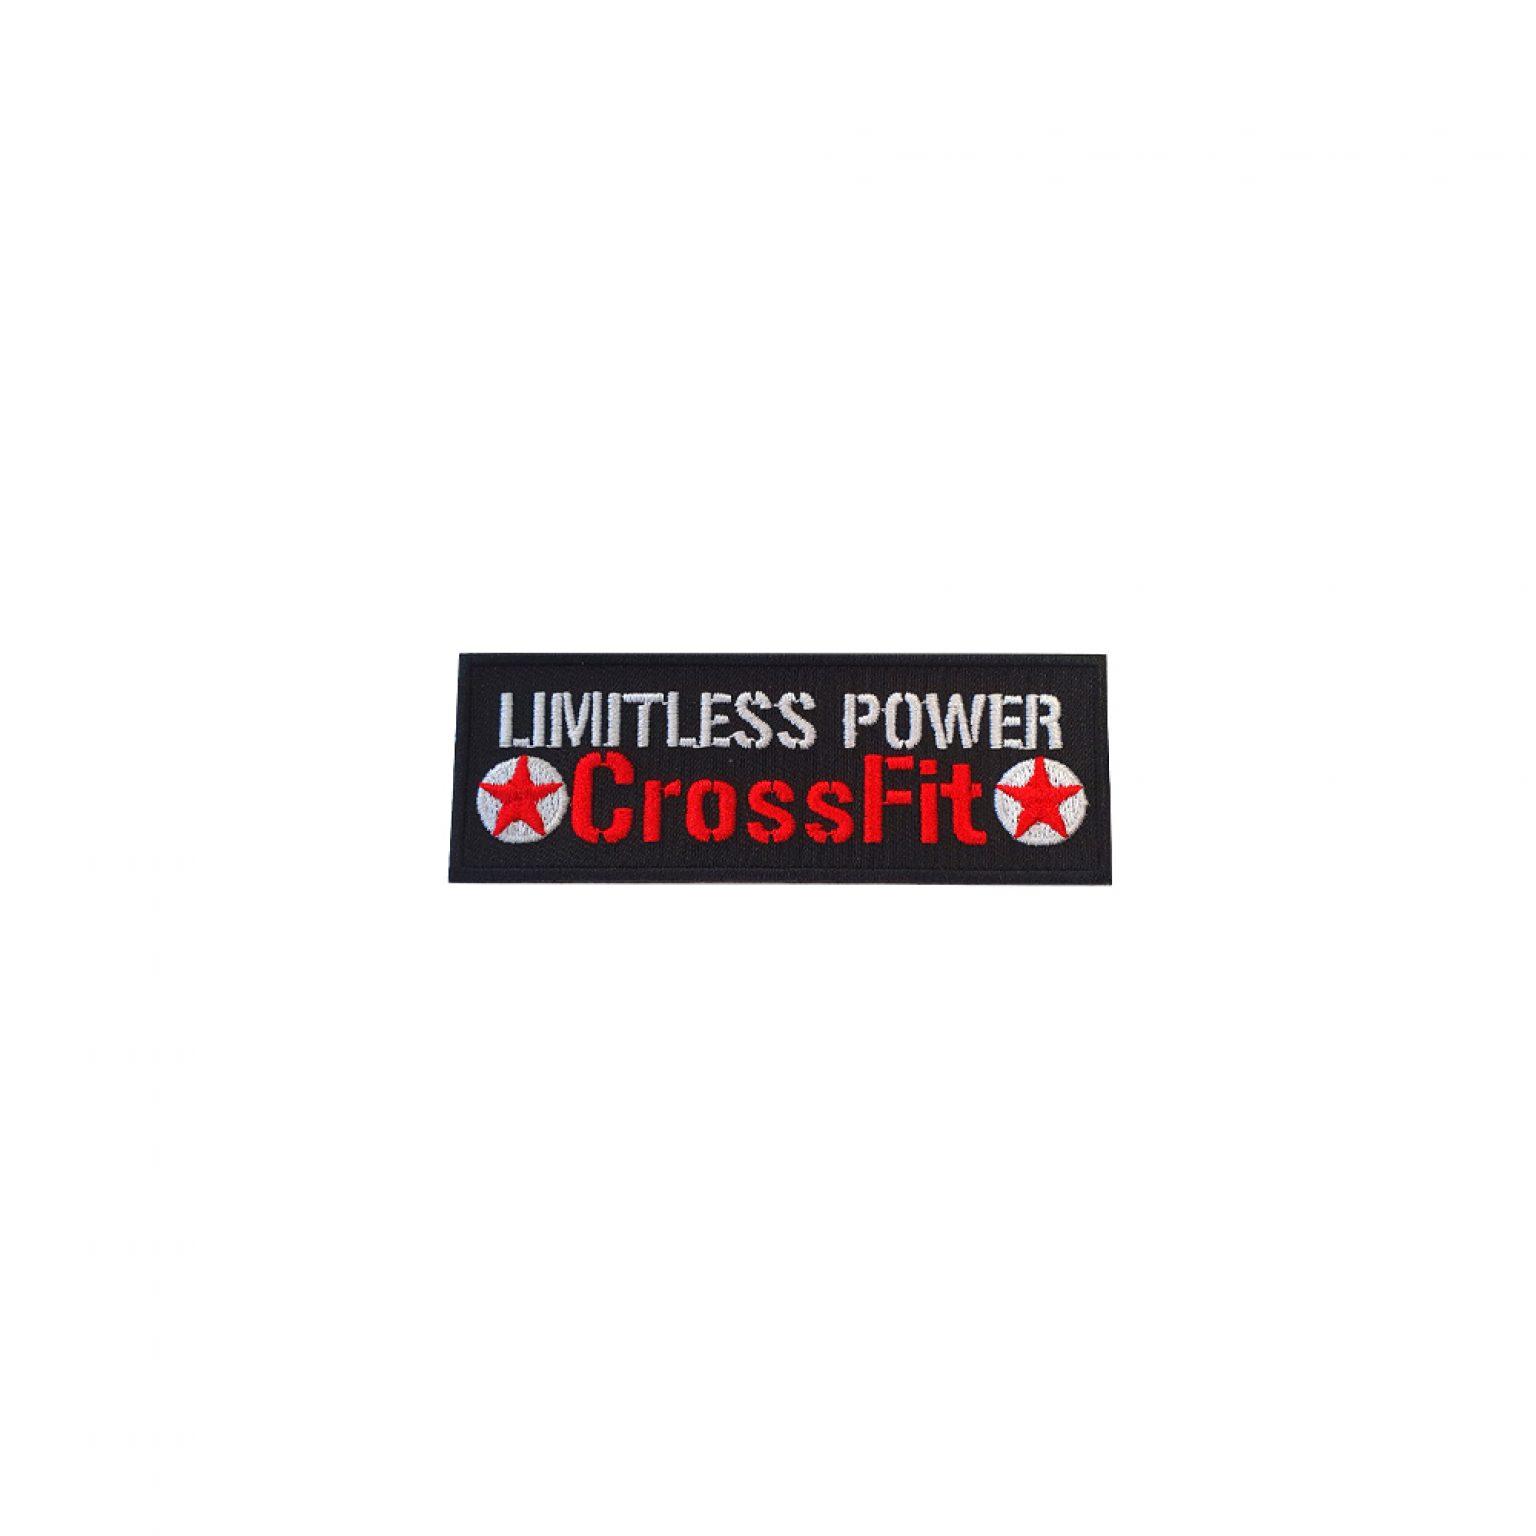 LimitlessPowerCrossFit Stick Patch